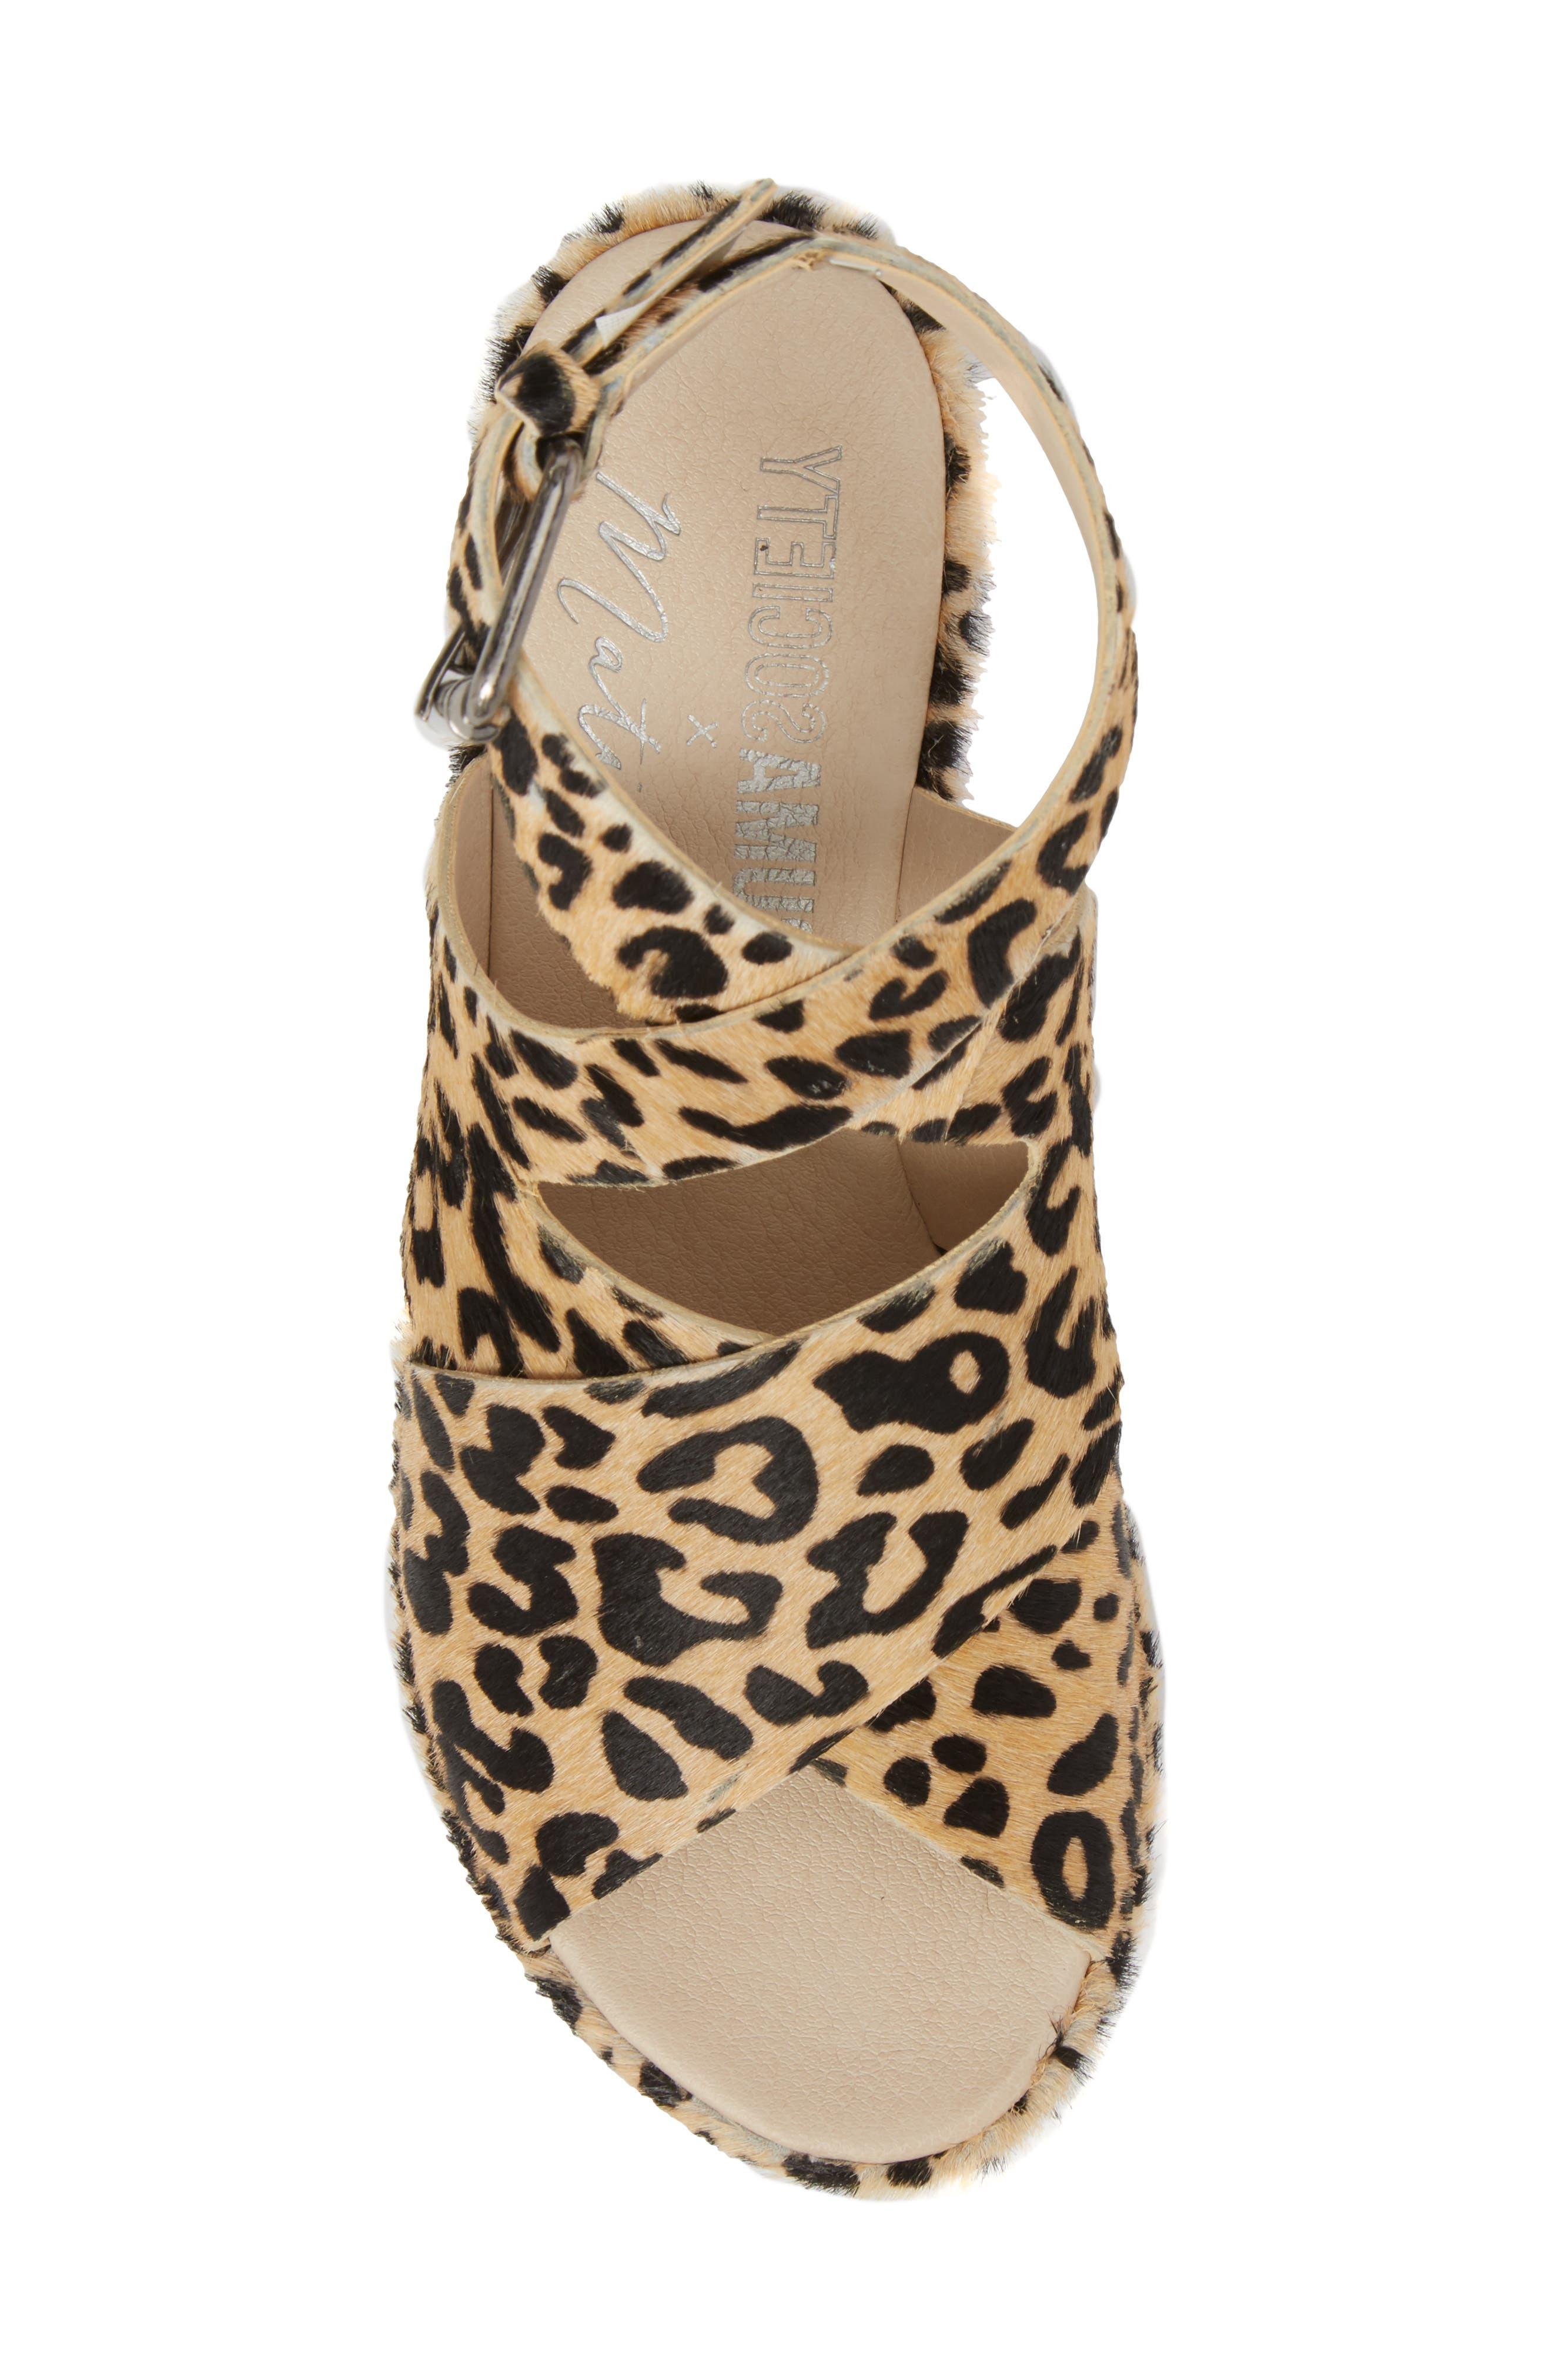 Runway Wedge Sandal,                             Alternate thumbnail 5, color,                             Leopard Calf Hair